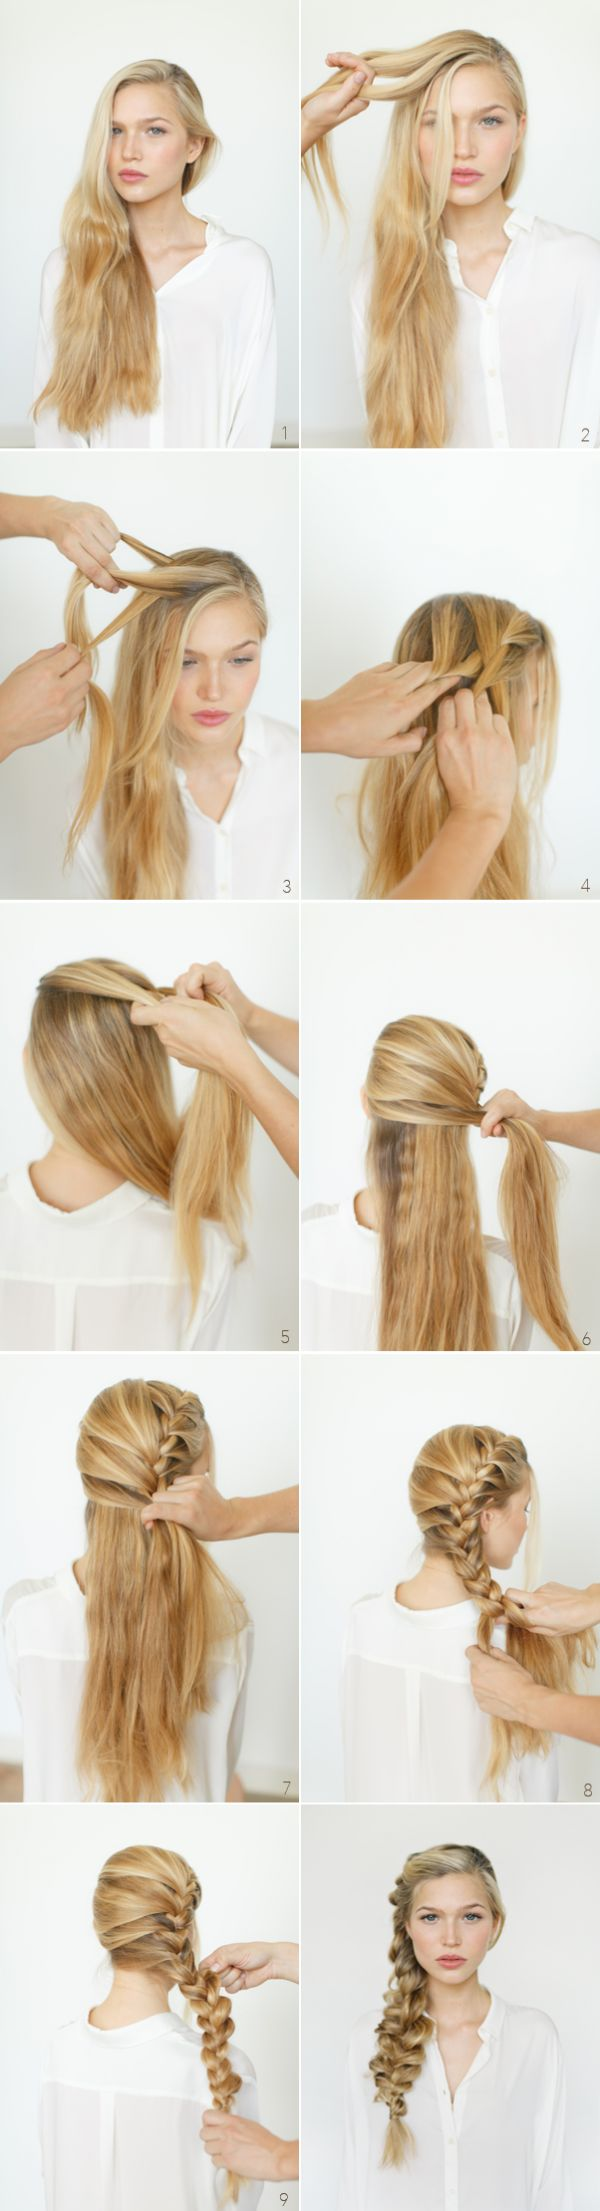 13 best Wedding Hairstyles images on Pinterest | Make up, Wedding ...